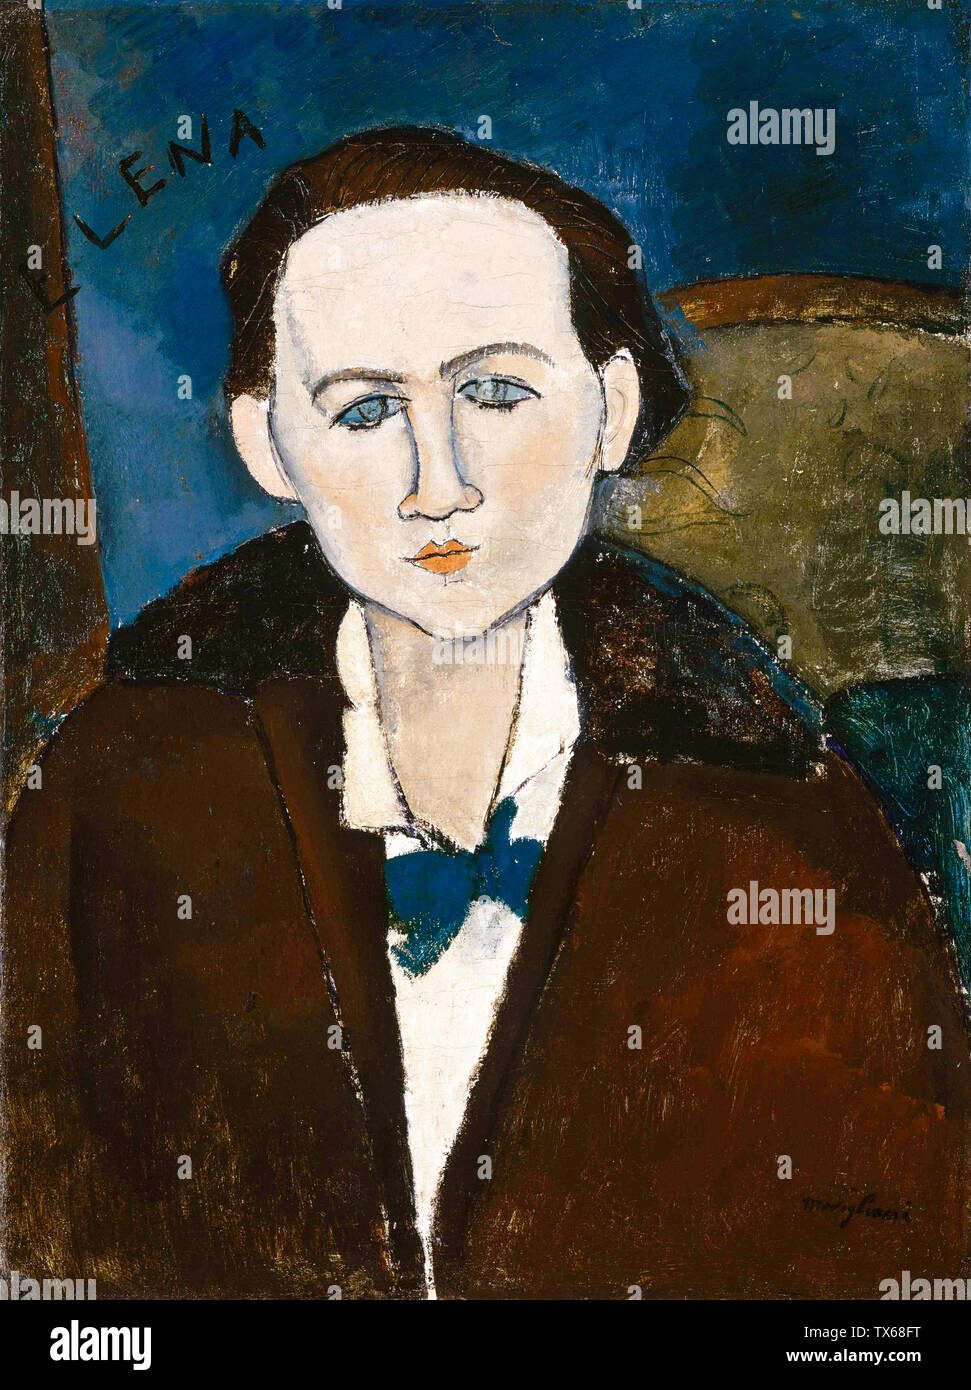 Amedeo Modigliani, Elena Povolozky, portrait painting, 1917 - Stock Image